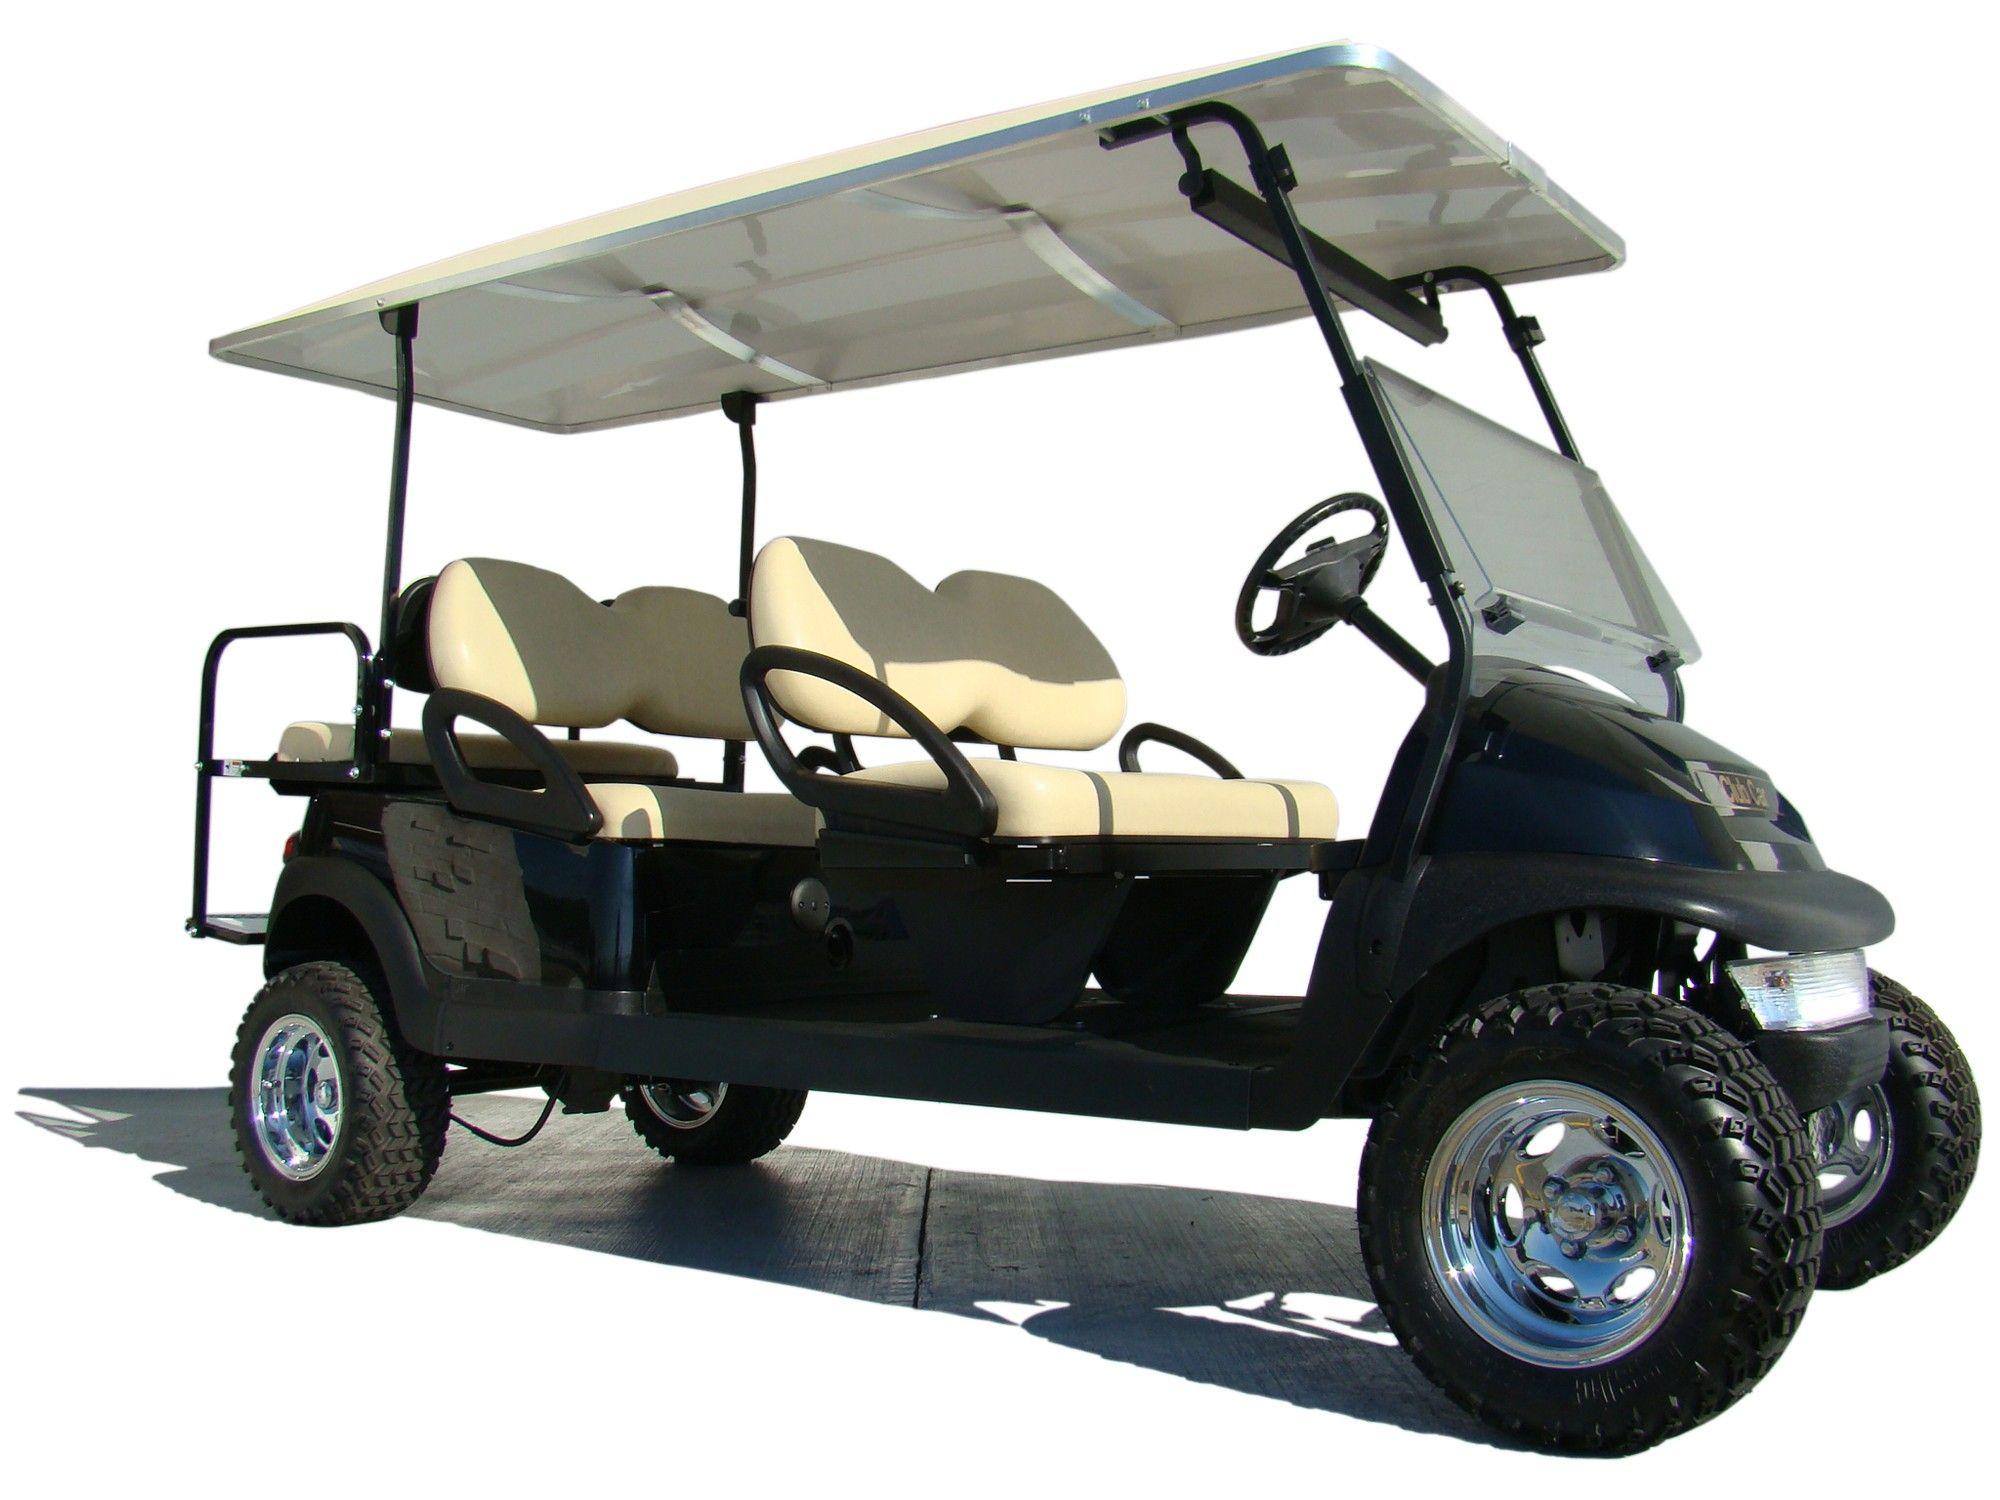 Club Car Golf Carts Custom Lifted 6 Seat Limo Golf Cart